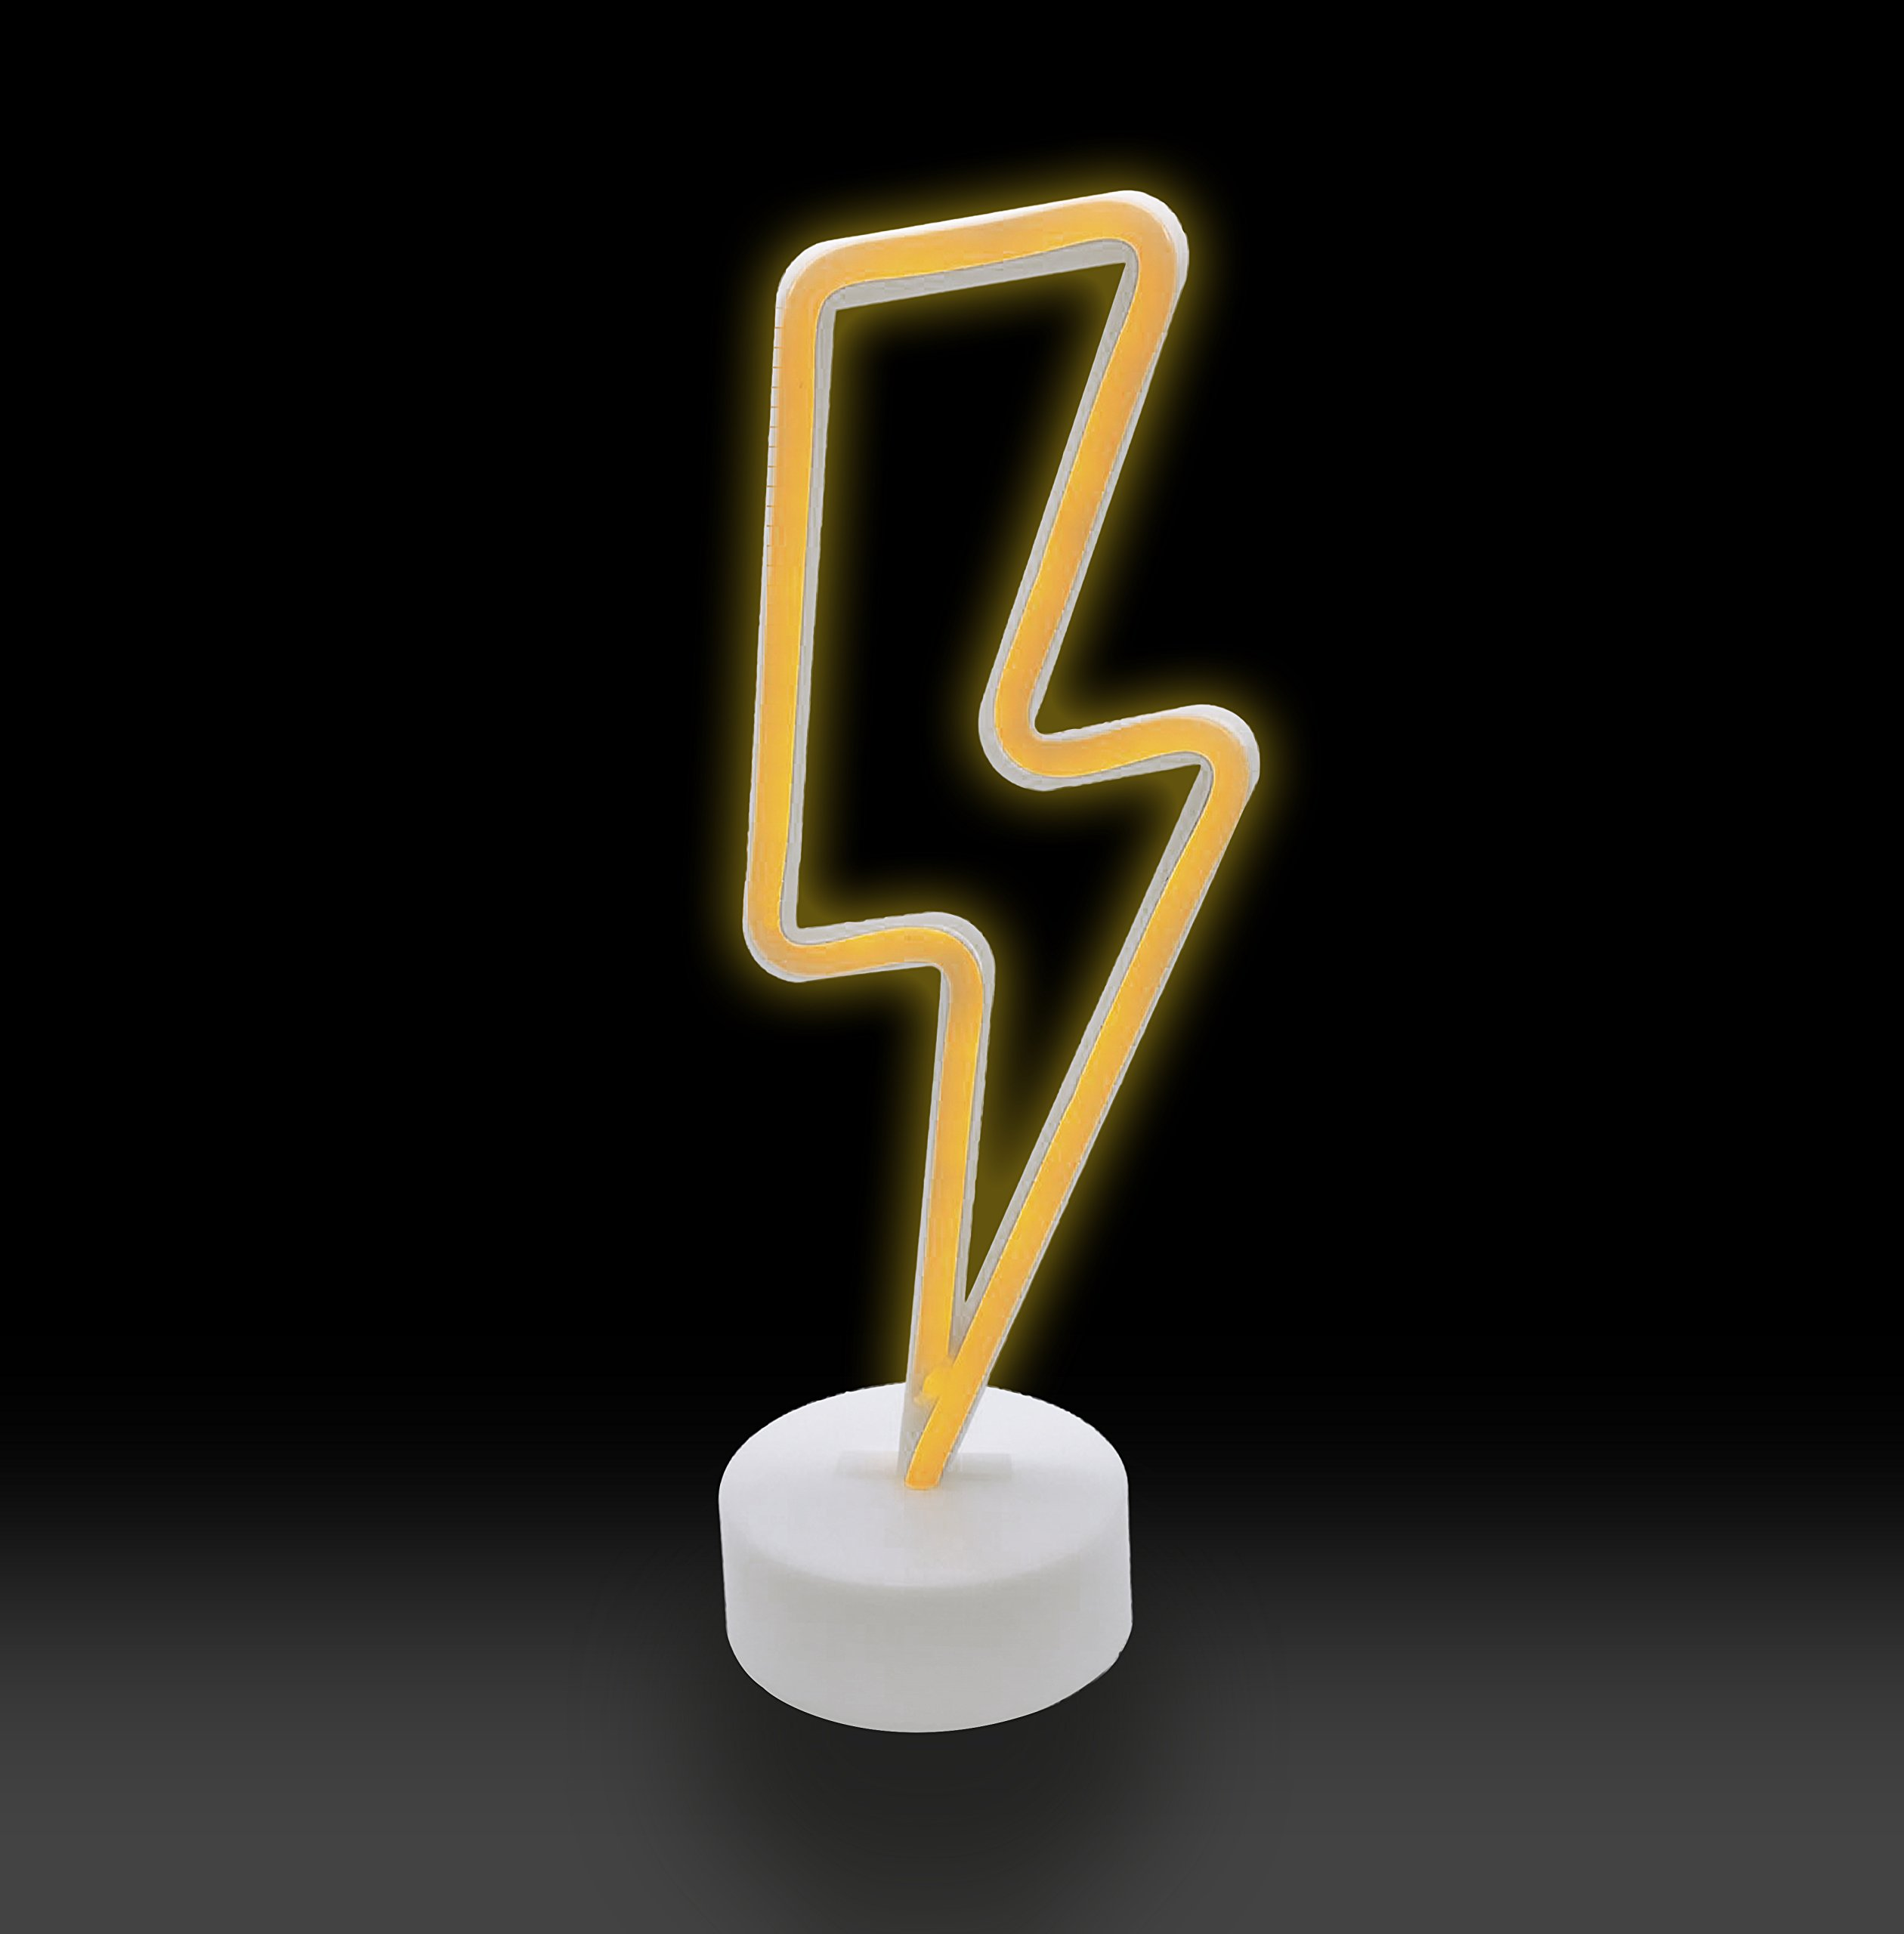 Yeaheo Neon Signs,Cactus Decor Night Light Neon Decor LED Neon Lights£¬for Bedroom Garden Birthday Party,Kids Room, Living Room, Wedding Bathroom Man Cave Party Decor Cactus (Yellow Lightning)